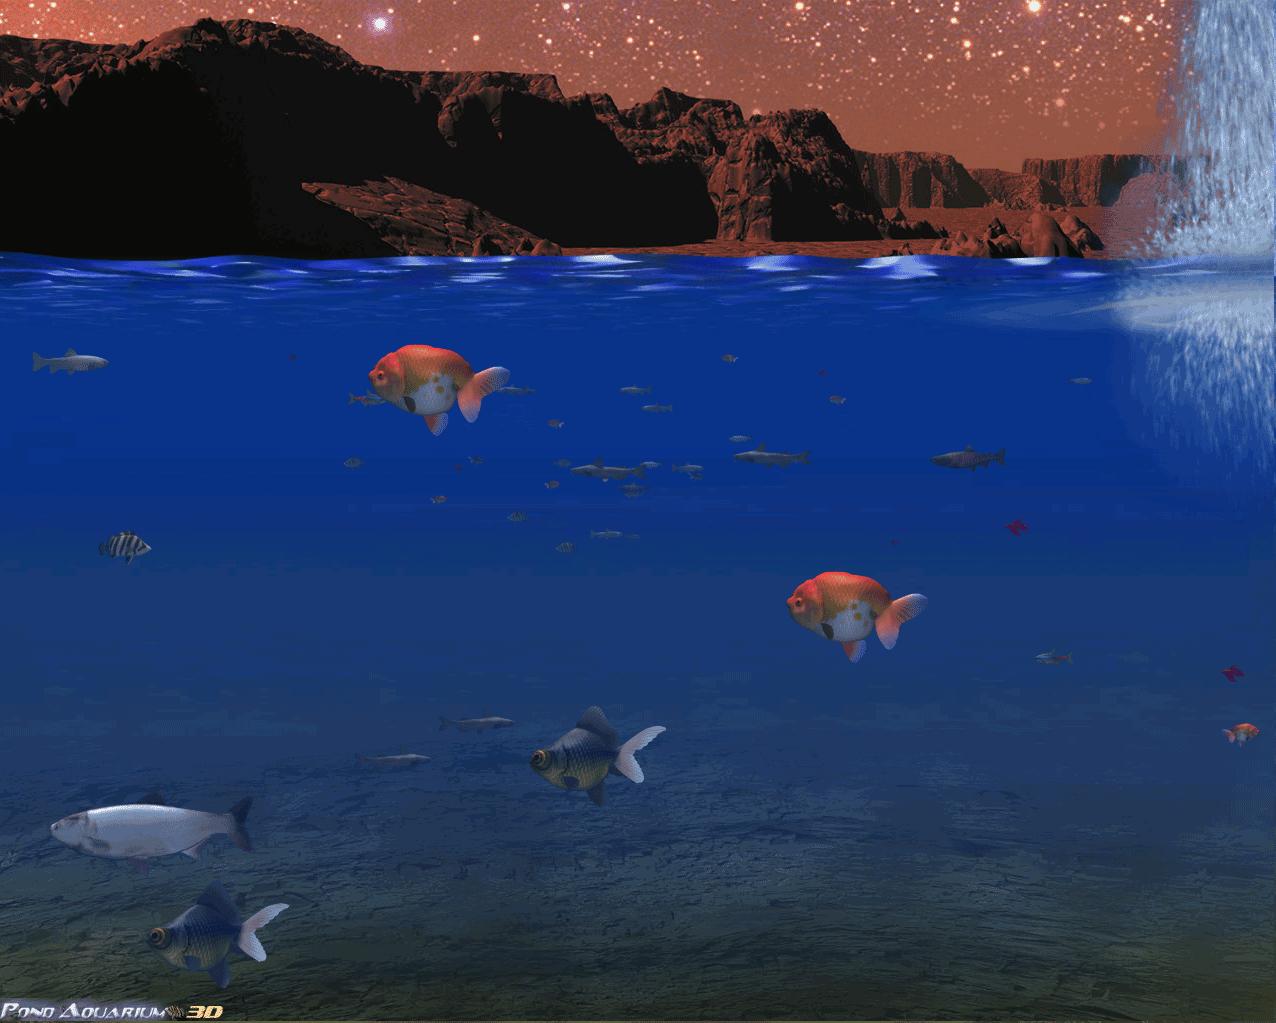 Pond aquarium 3d deluxe edition selectsoft for Pond aquarium